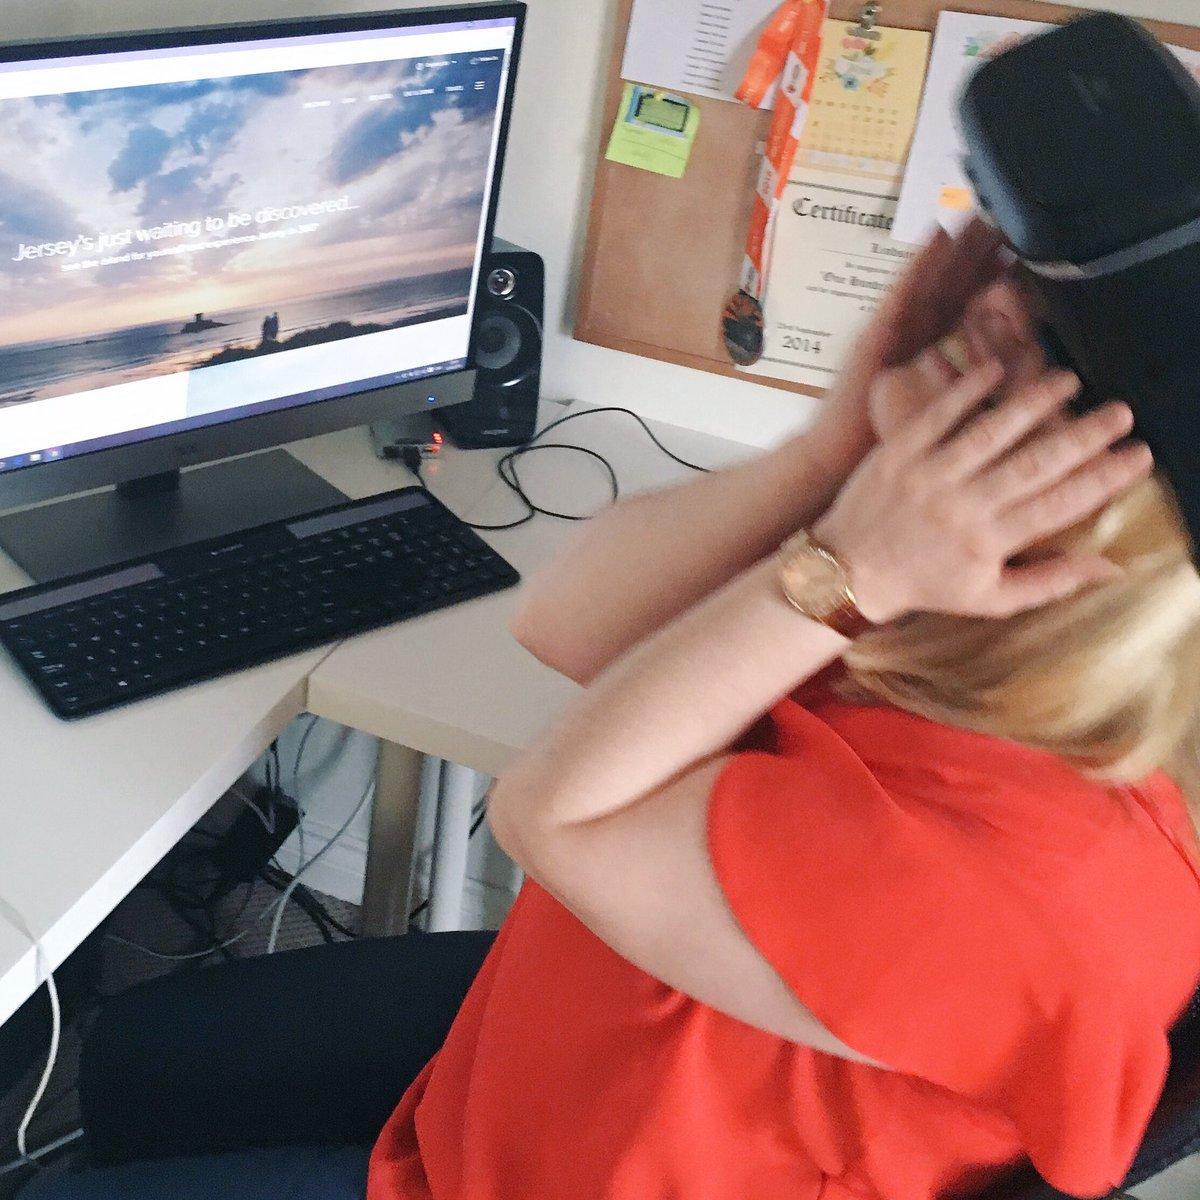 Well @VisitJerseyCI, I am amazed! #theislandbreak #360video #marketing https://t.co/FILjbJqu1c